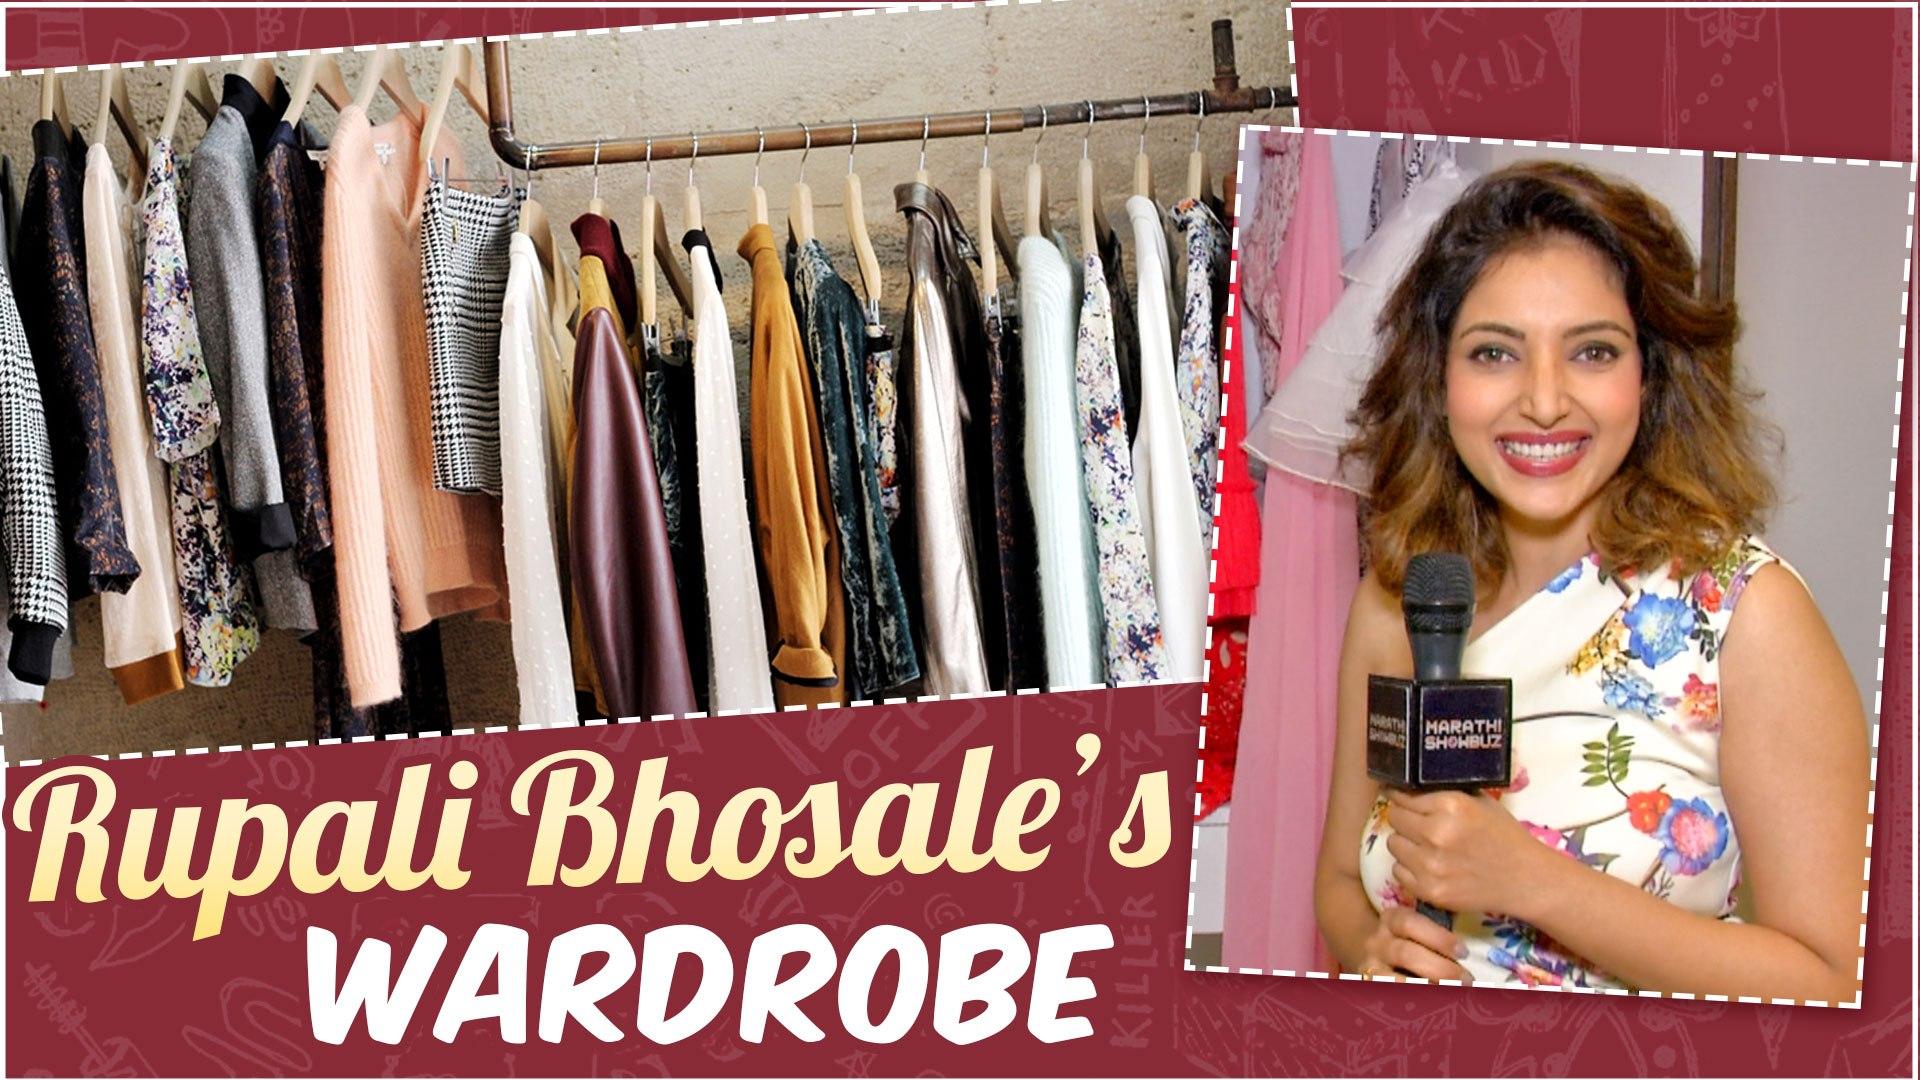 Rupali Bhosale Rupali Bhosale S Wardrobe Marathi Bigg Boss 2 Video Dailymotion